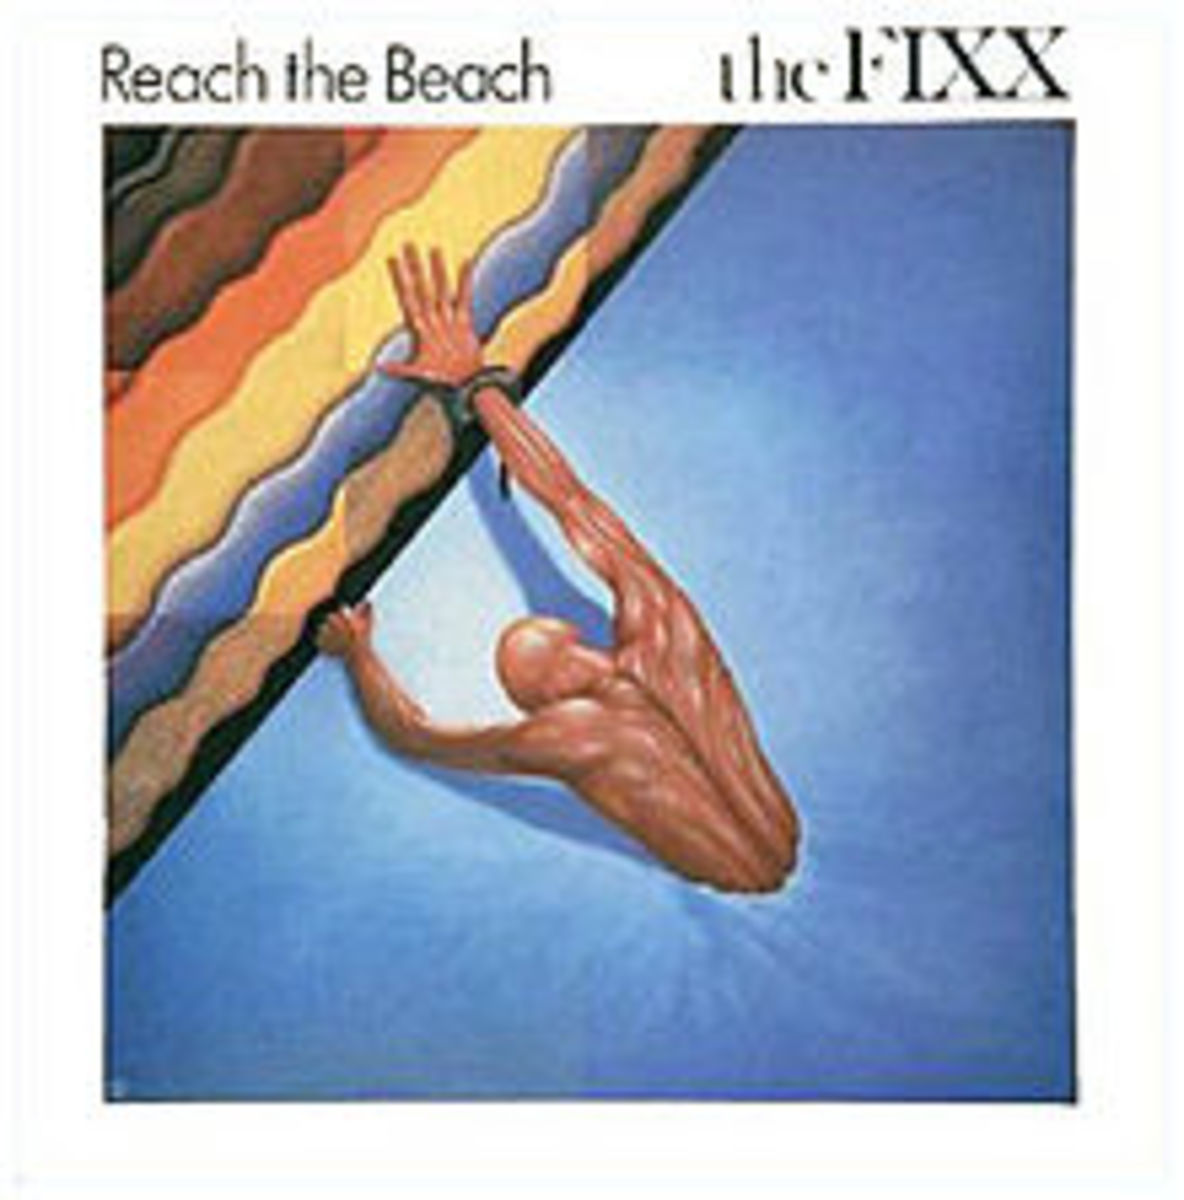 220px-The_Fixx_-_Reach_the_Beach